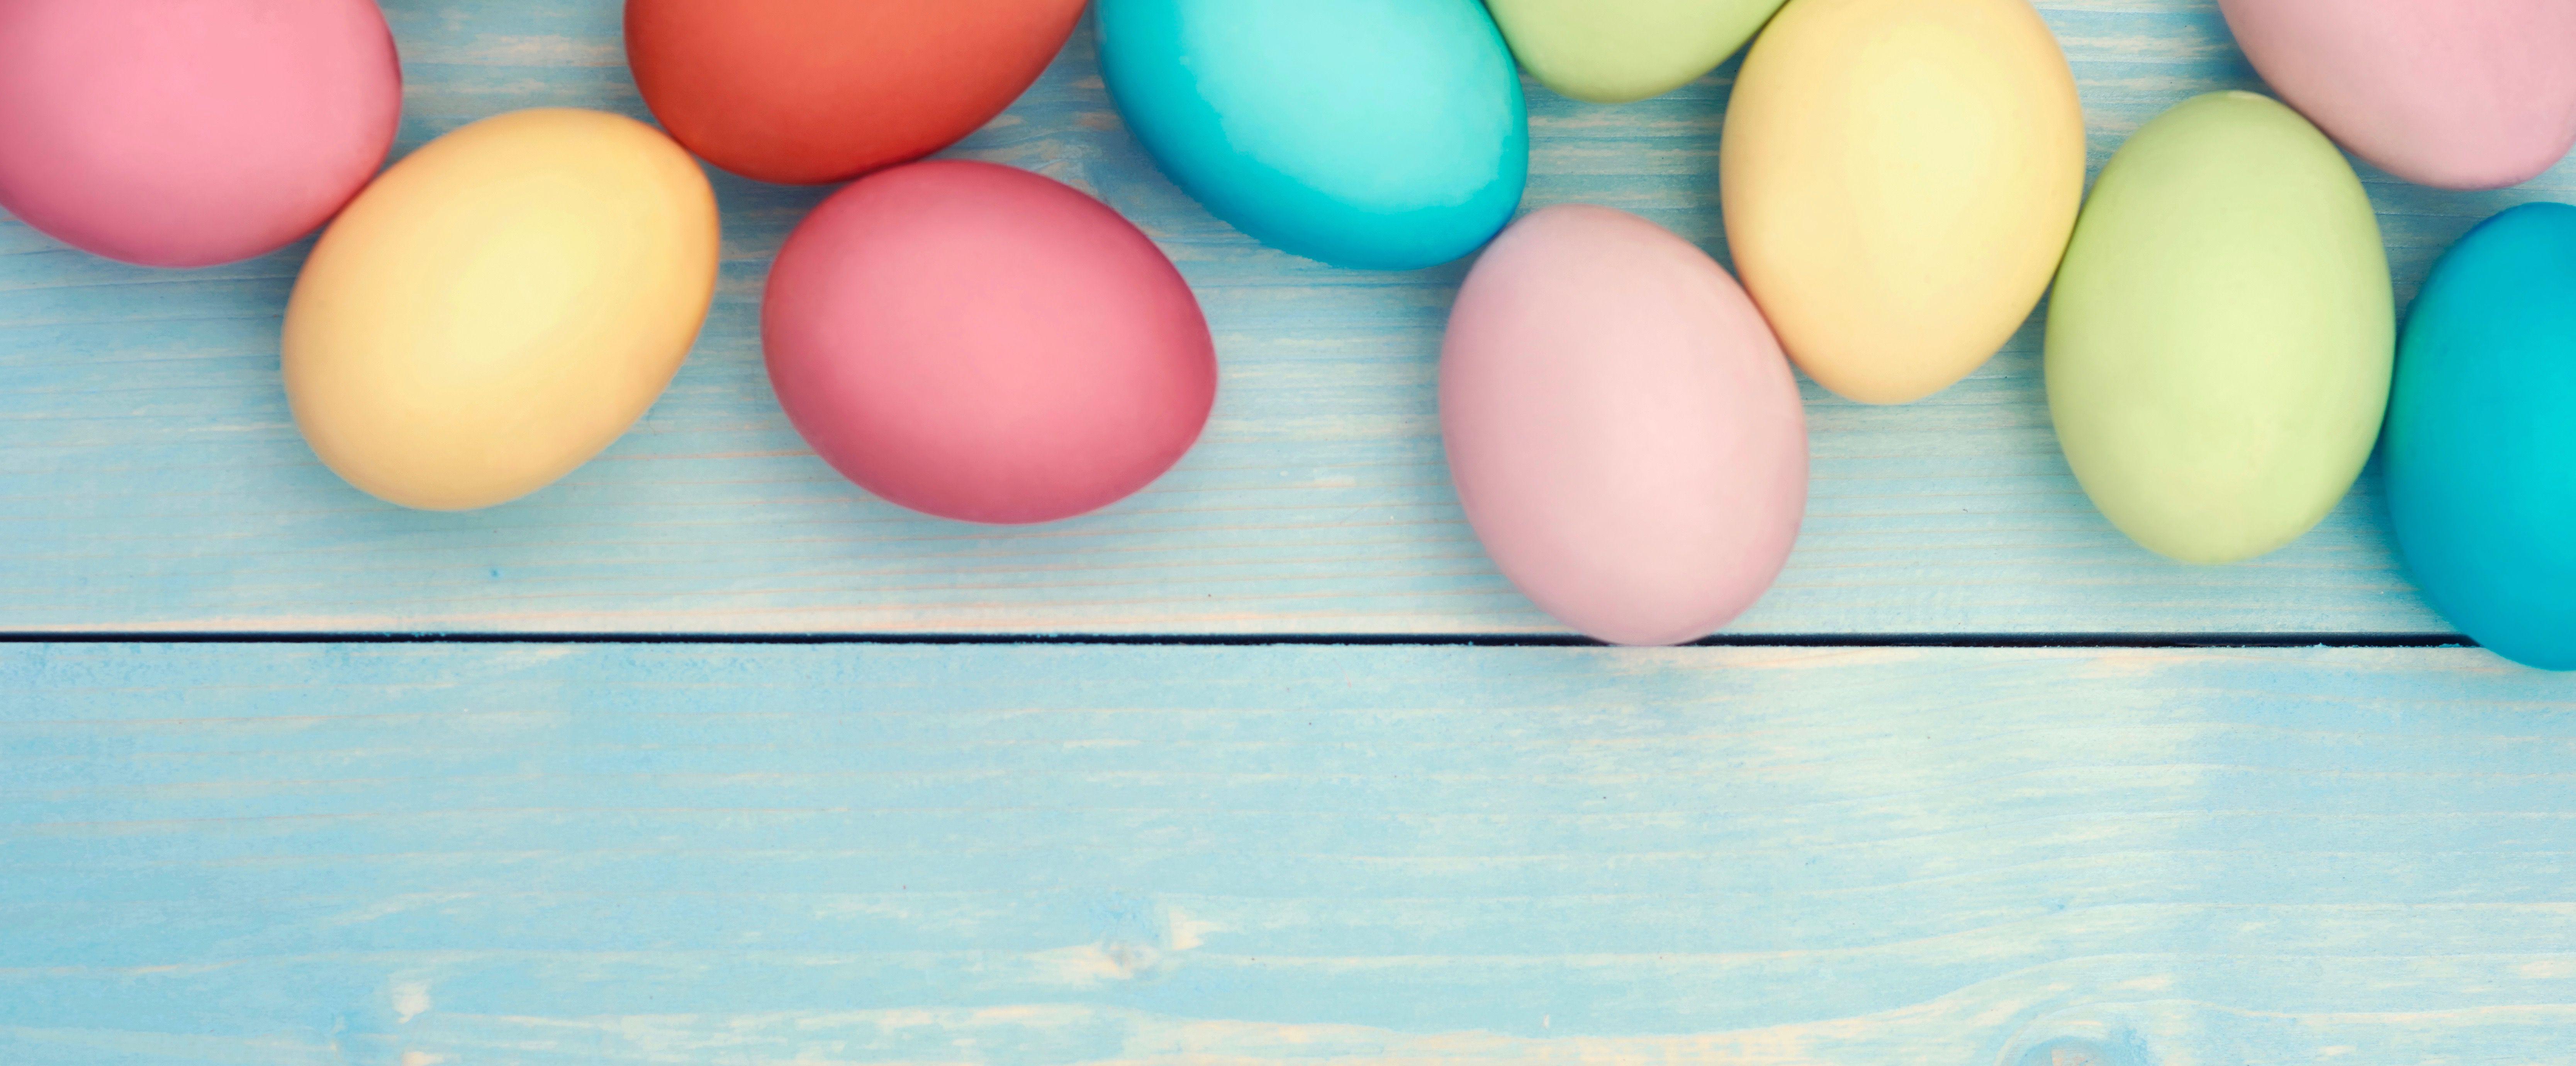 Internet-Easter-Eggs-compressor.jpg  Easter Eggs: 10 of the Internet's Best Hidden Gems Internet Easter Eggs compressor